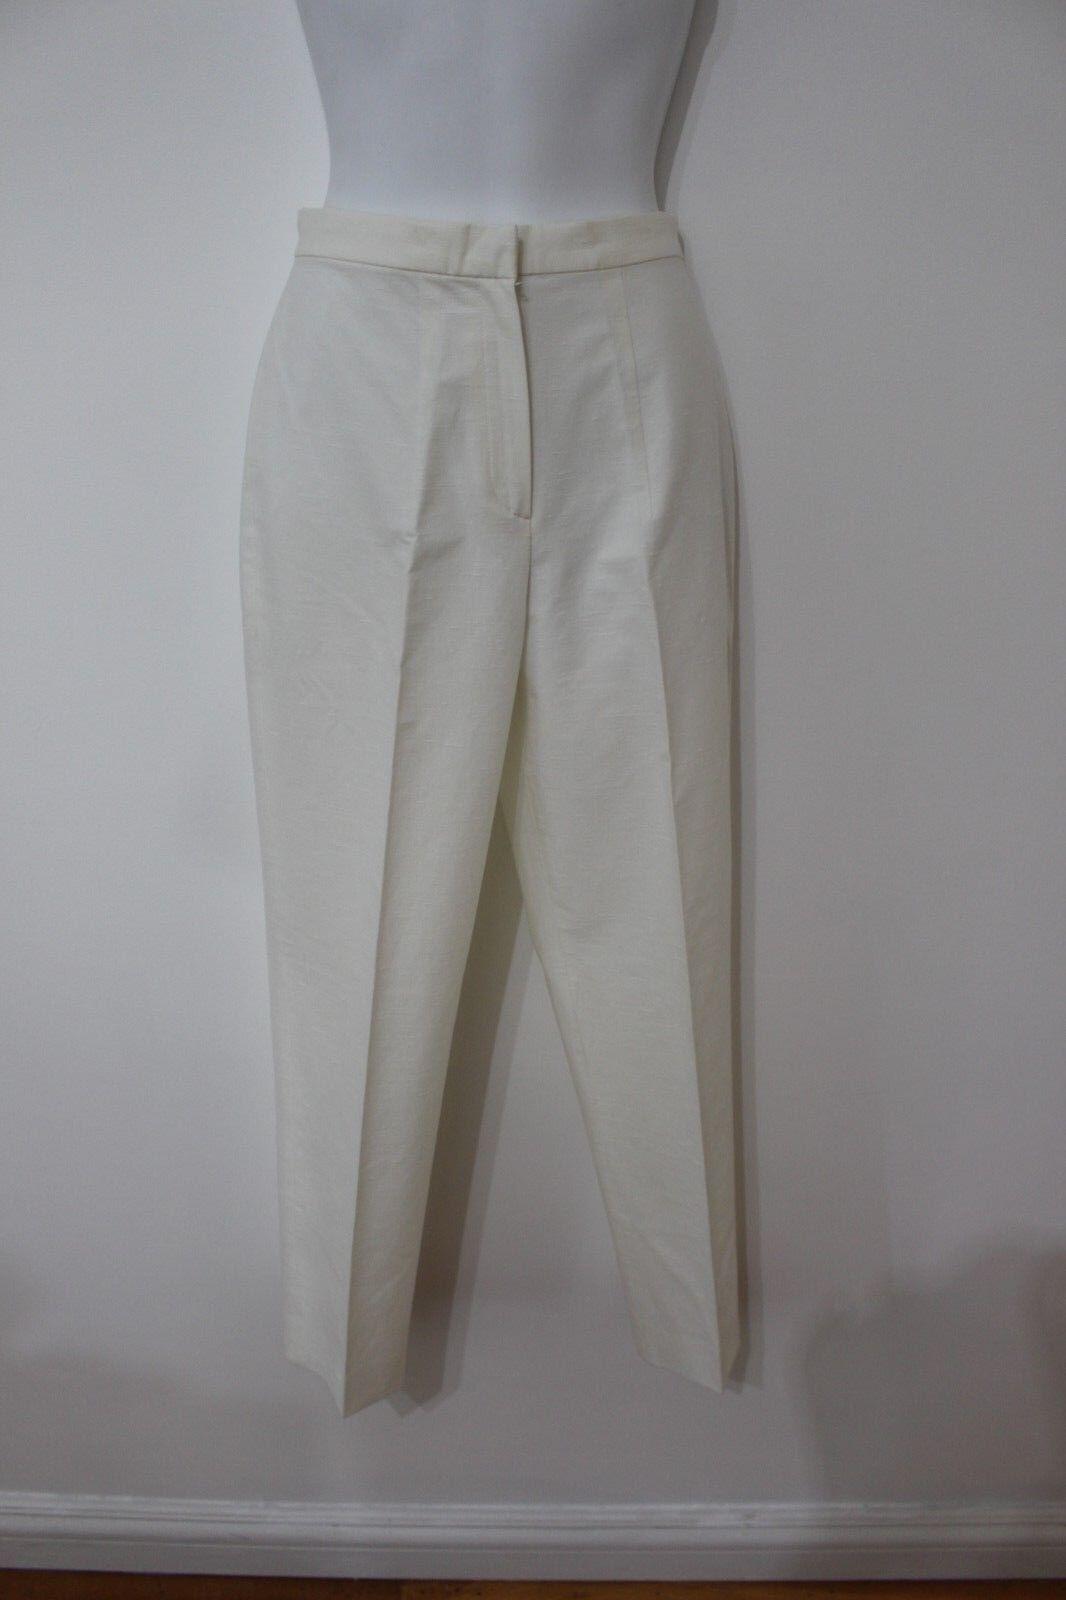 Giorgio Armani White Capri Pants Sz 4 NWT